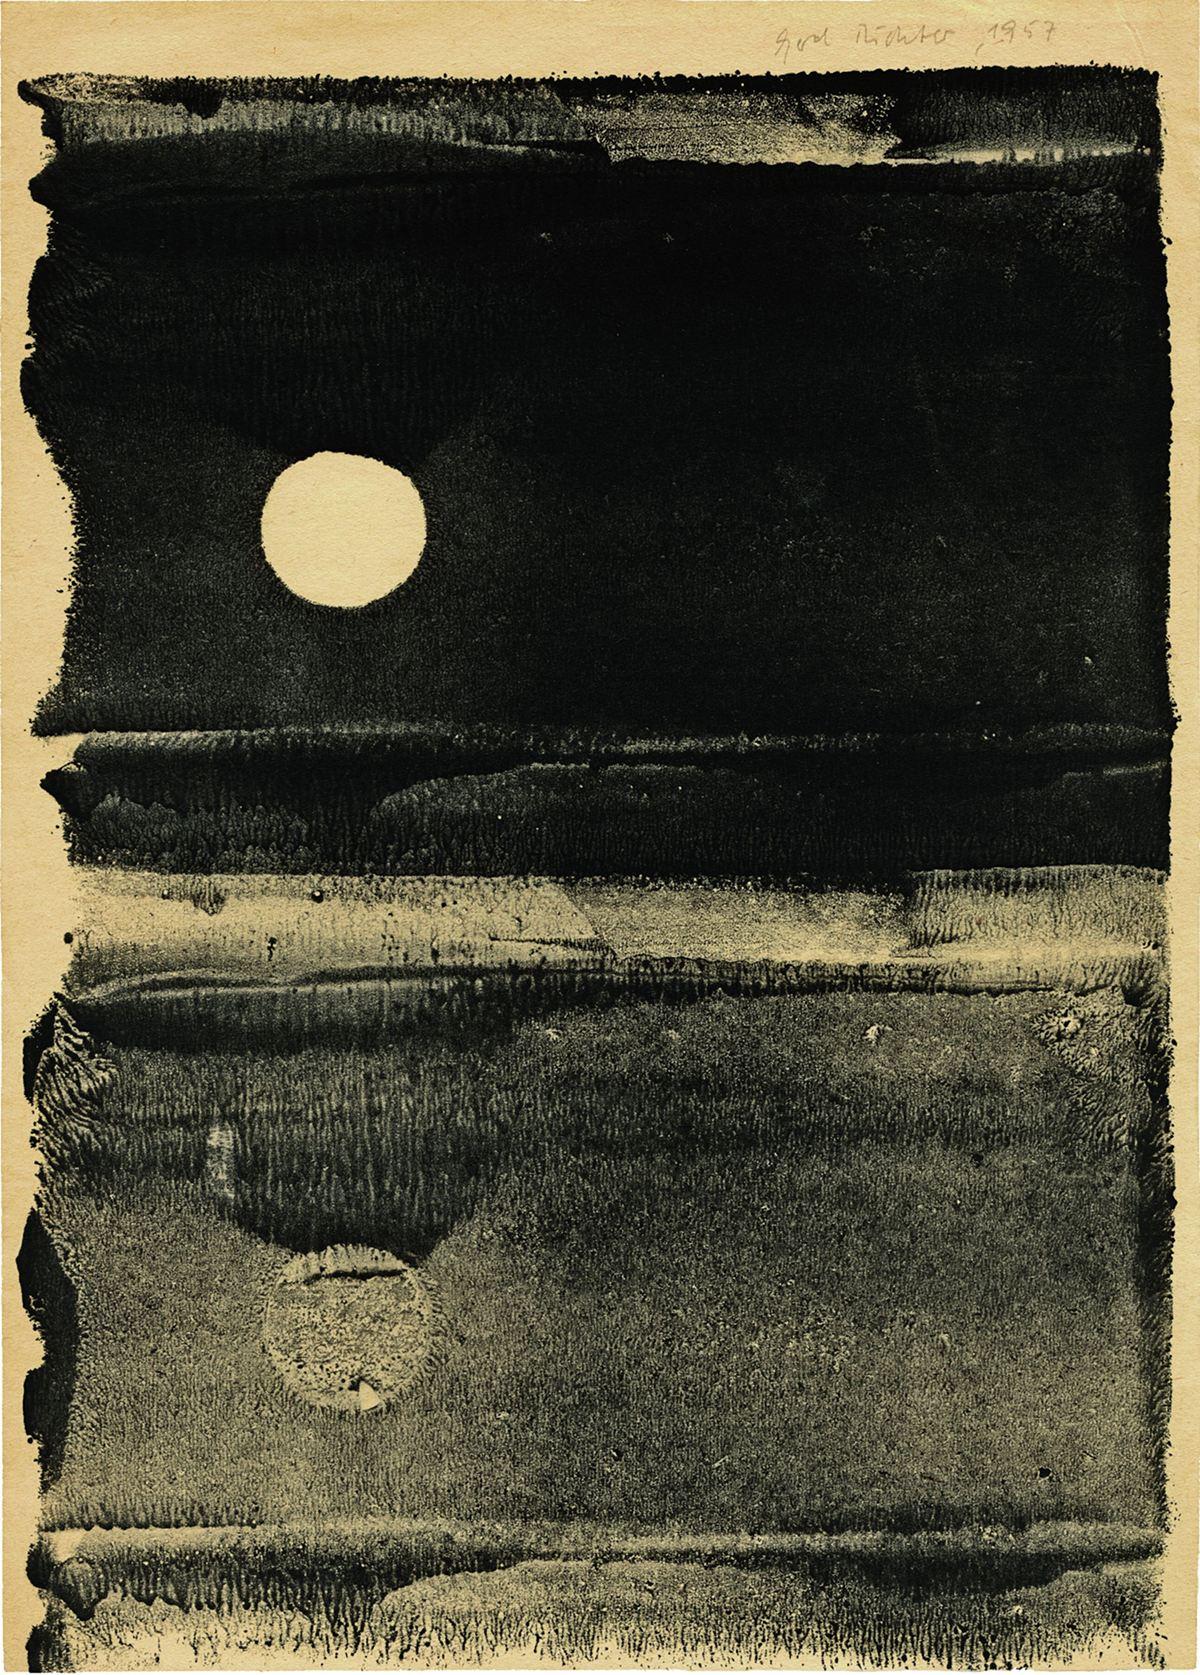 Gerhard Richter, courtesy Kunstmuseum Winterthur, ADAGP